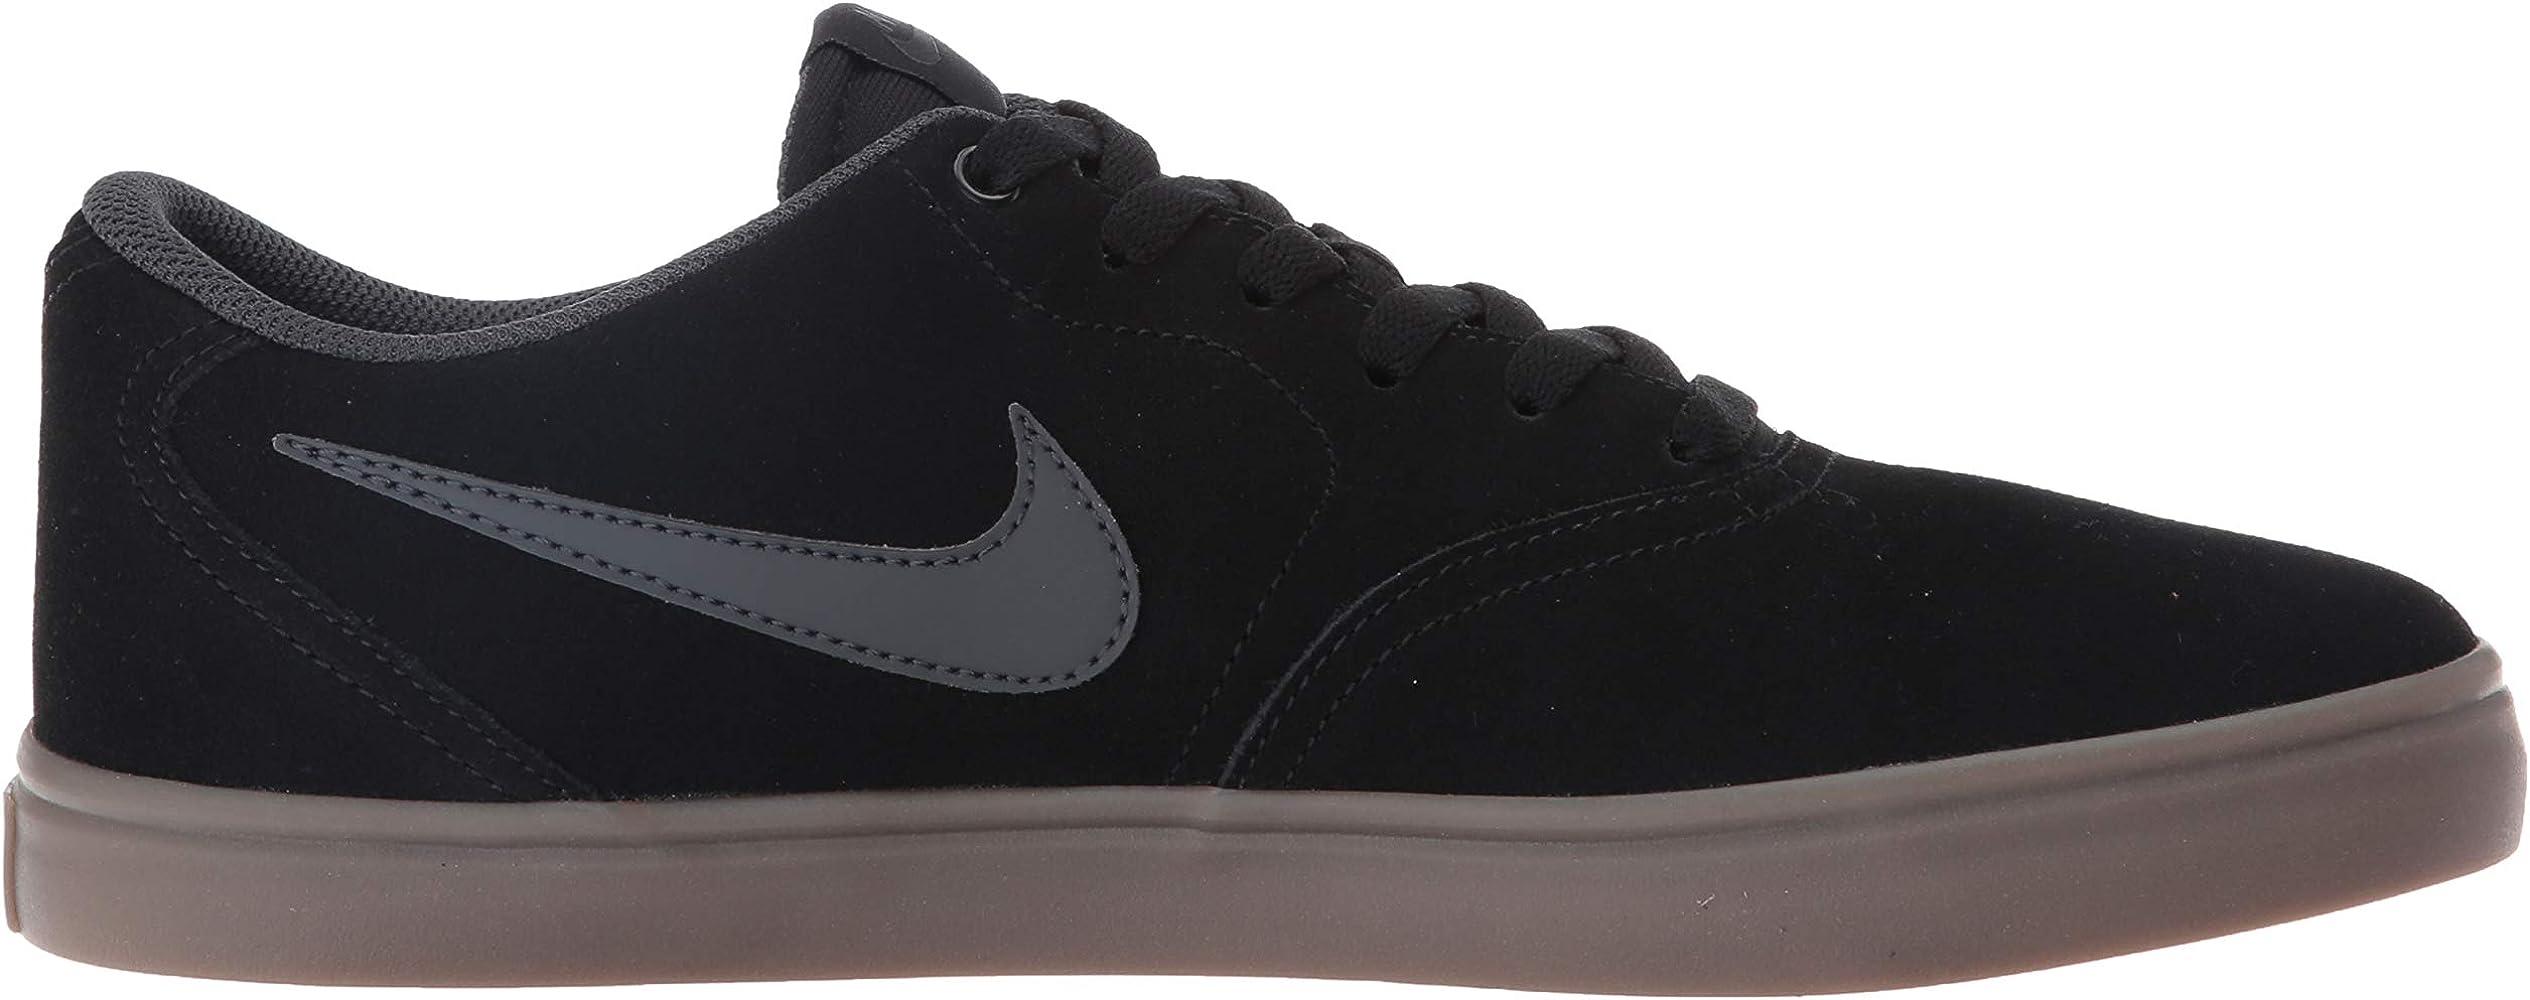 Nike Men's SB Check Solarsoft Skate Shoe Black/White